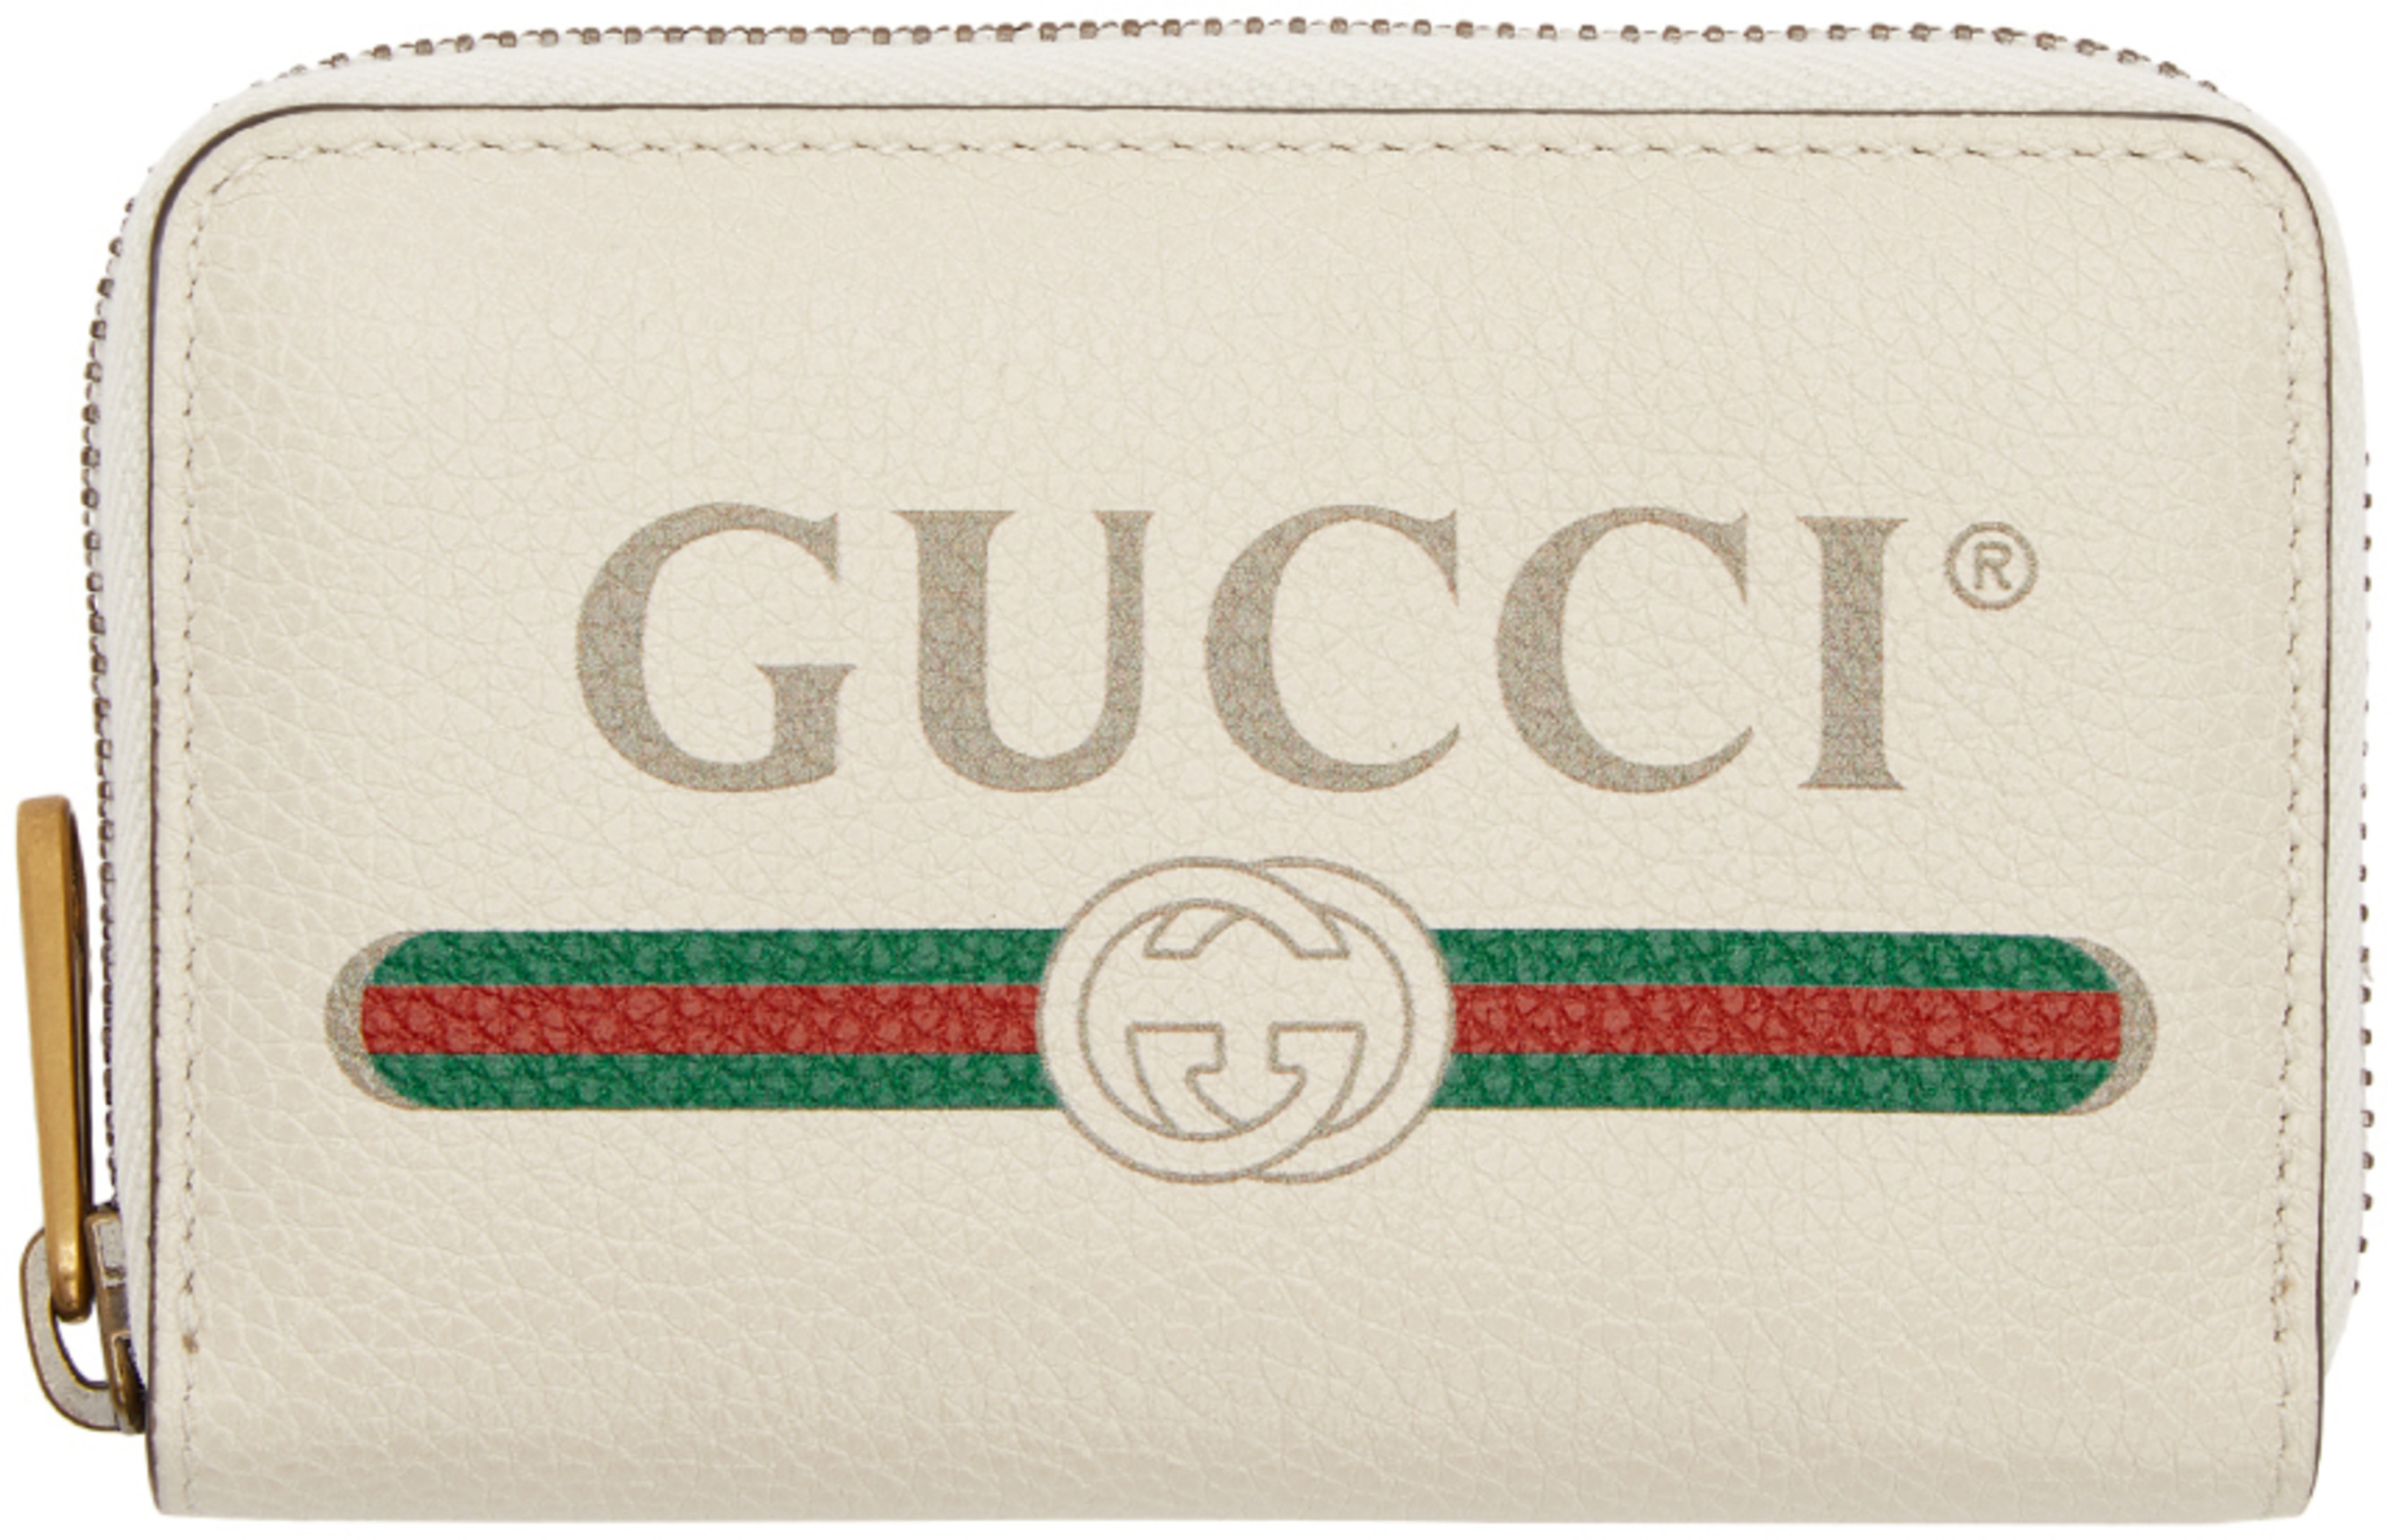 263849258e54 Gucci wallets & card holders for Women | SSENSE Canada